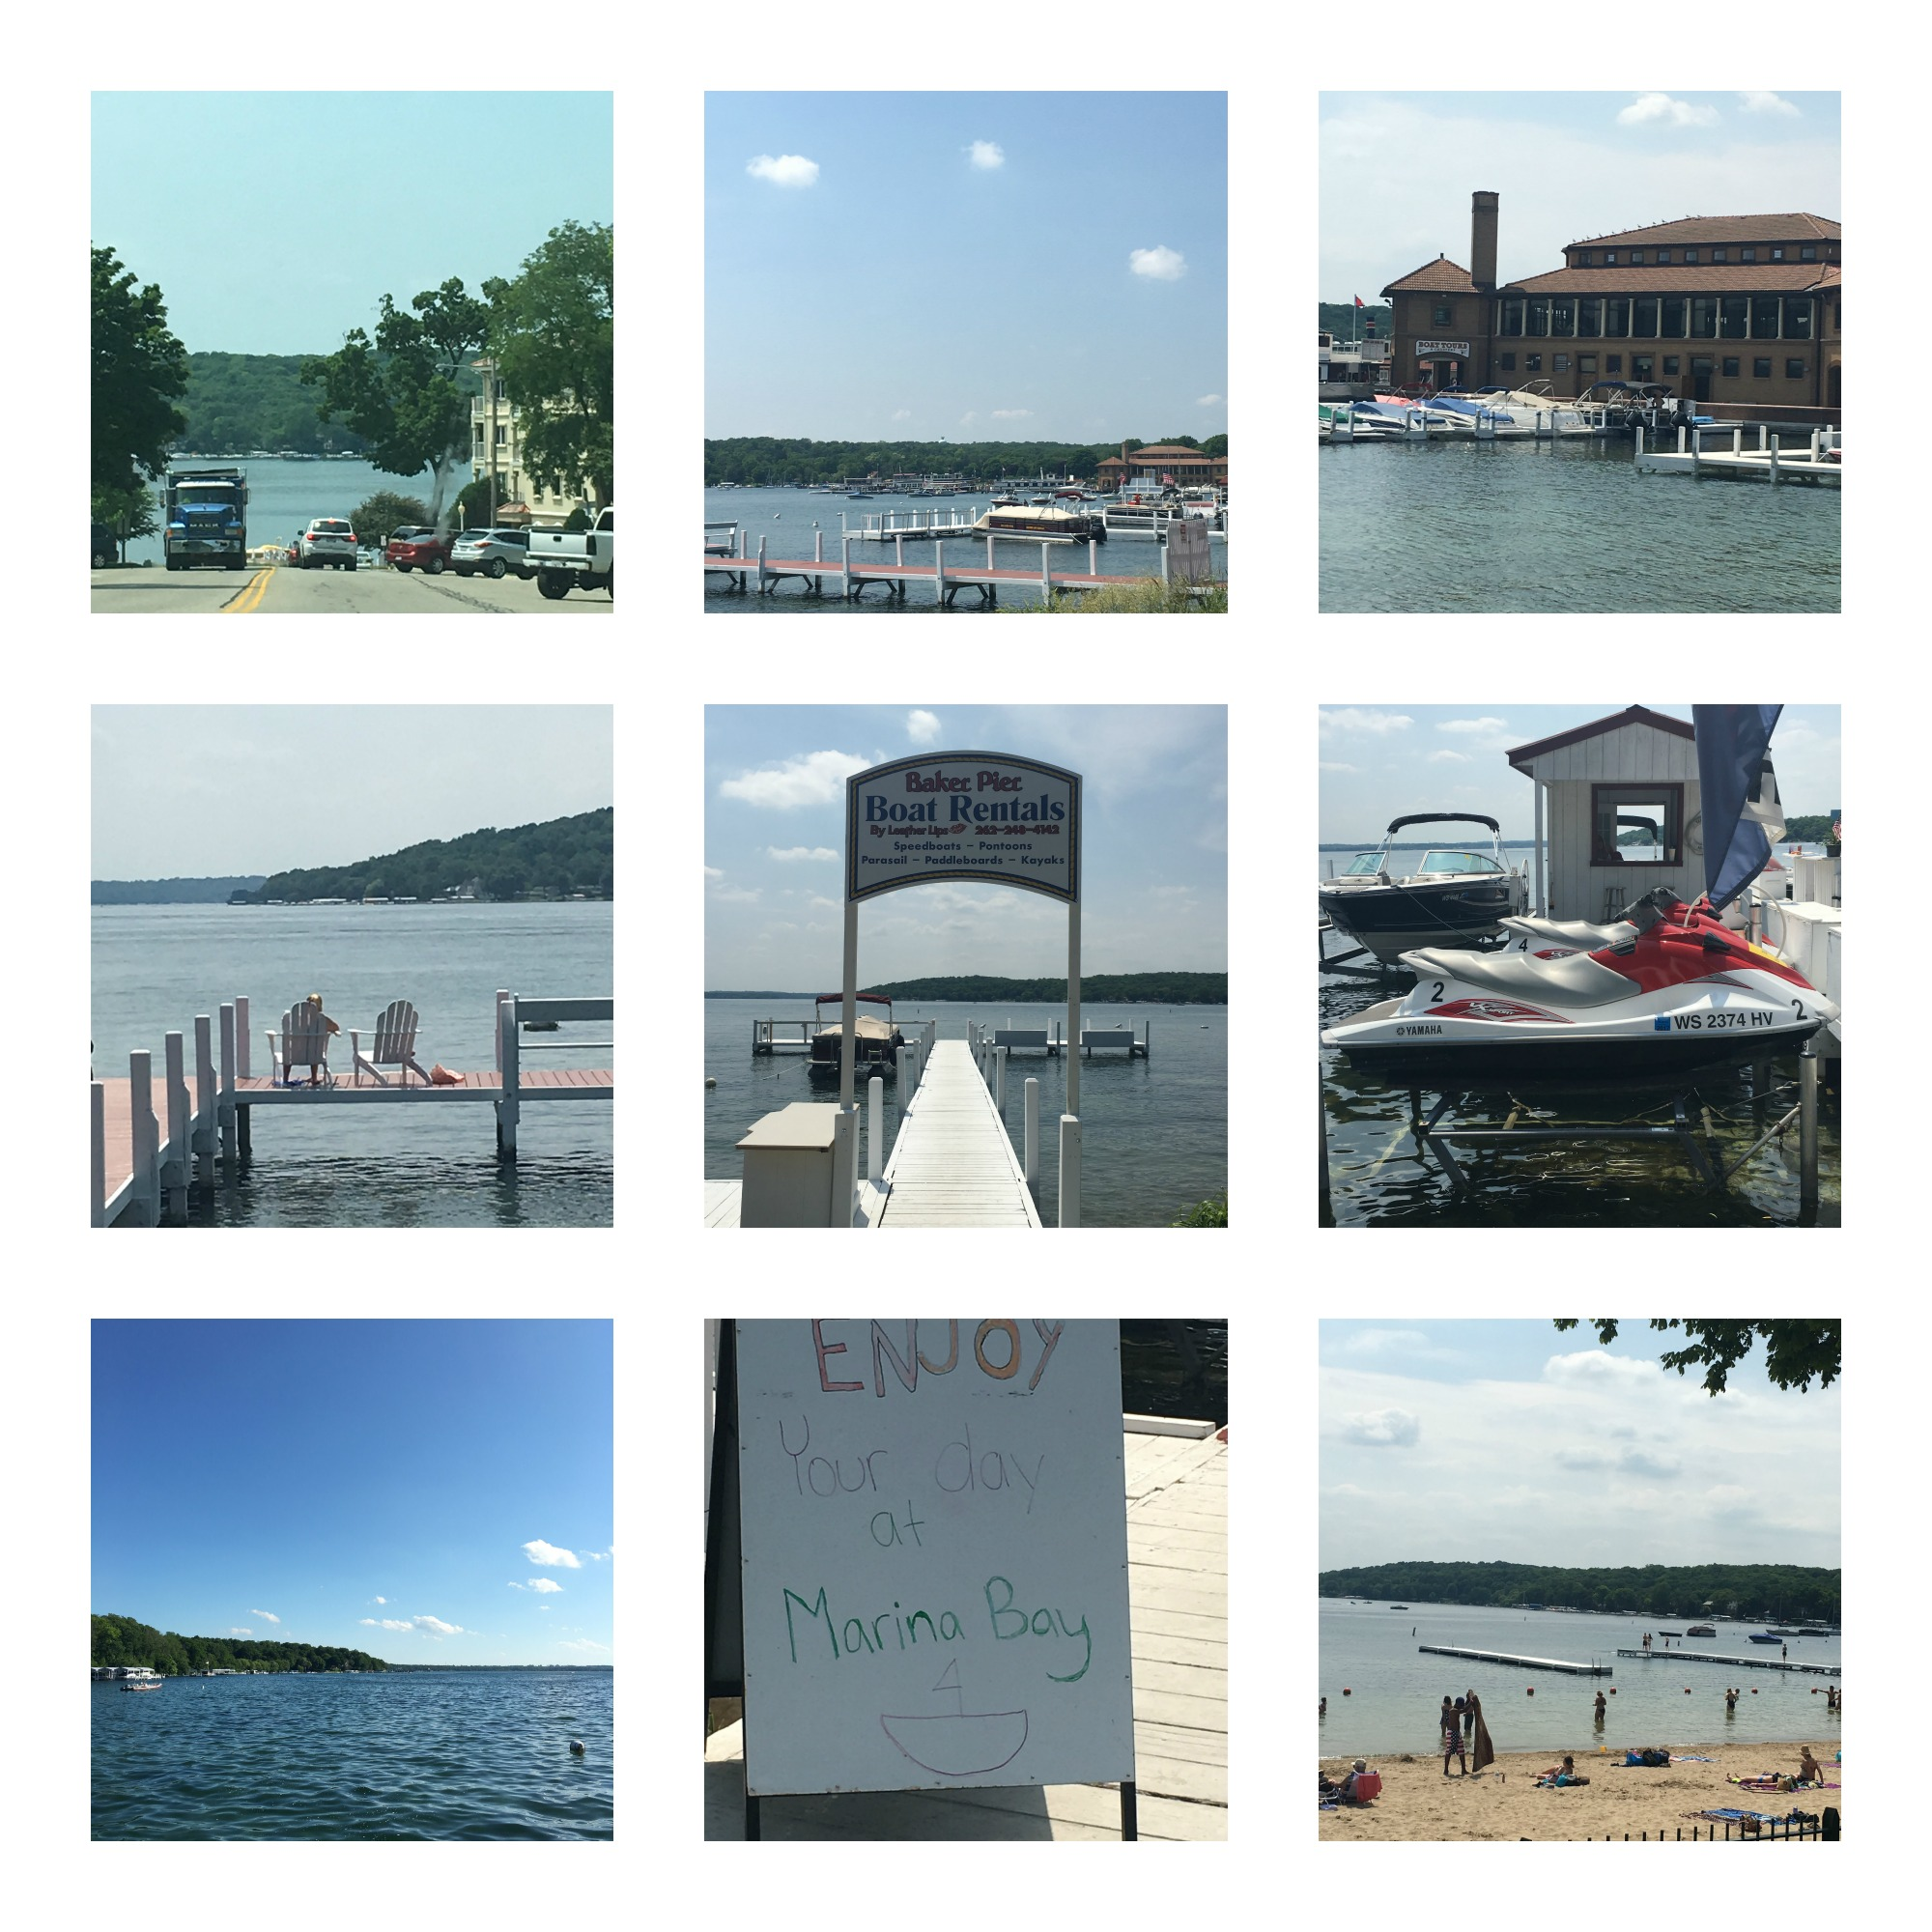 A Vacation Guide to Lake Geneva